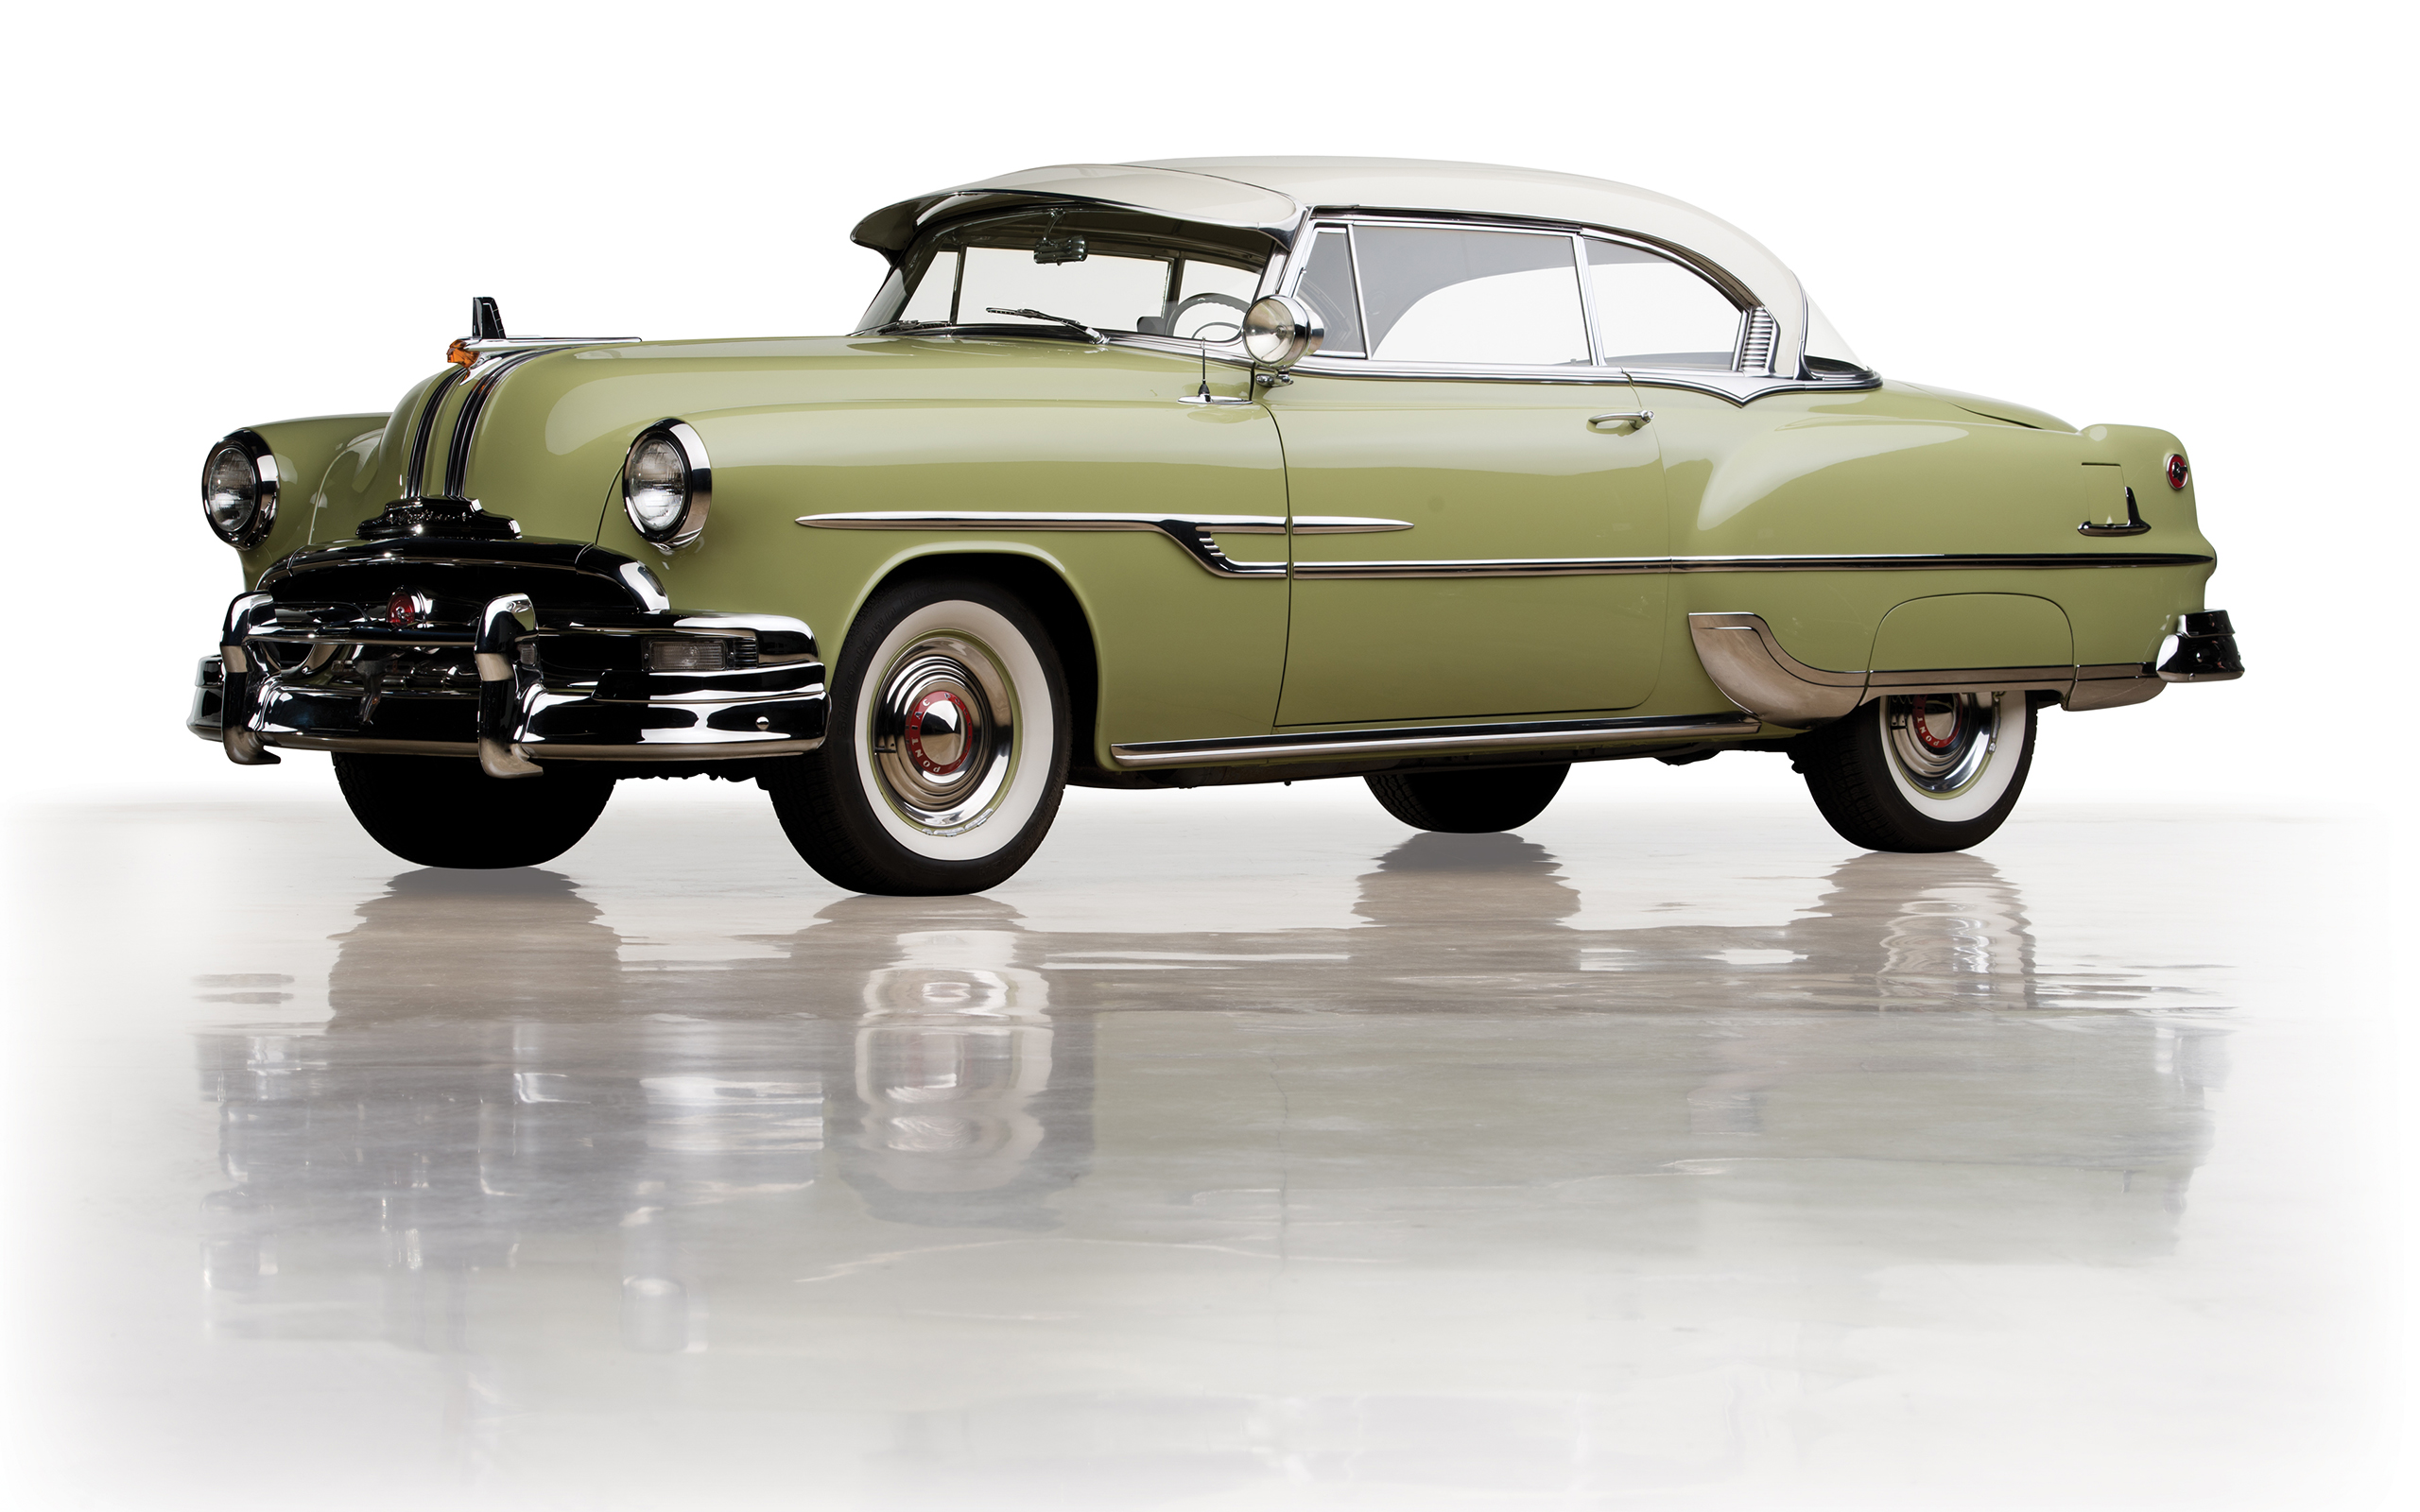 1953 Pontiac Chieftain Deluxe Eight Catalina Coupe Autopik